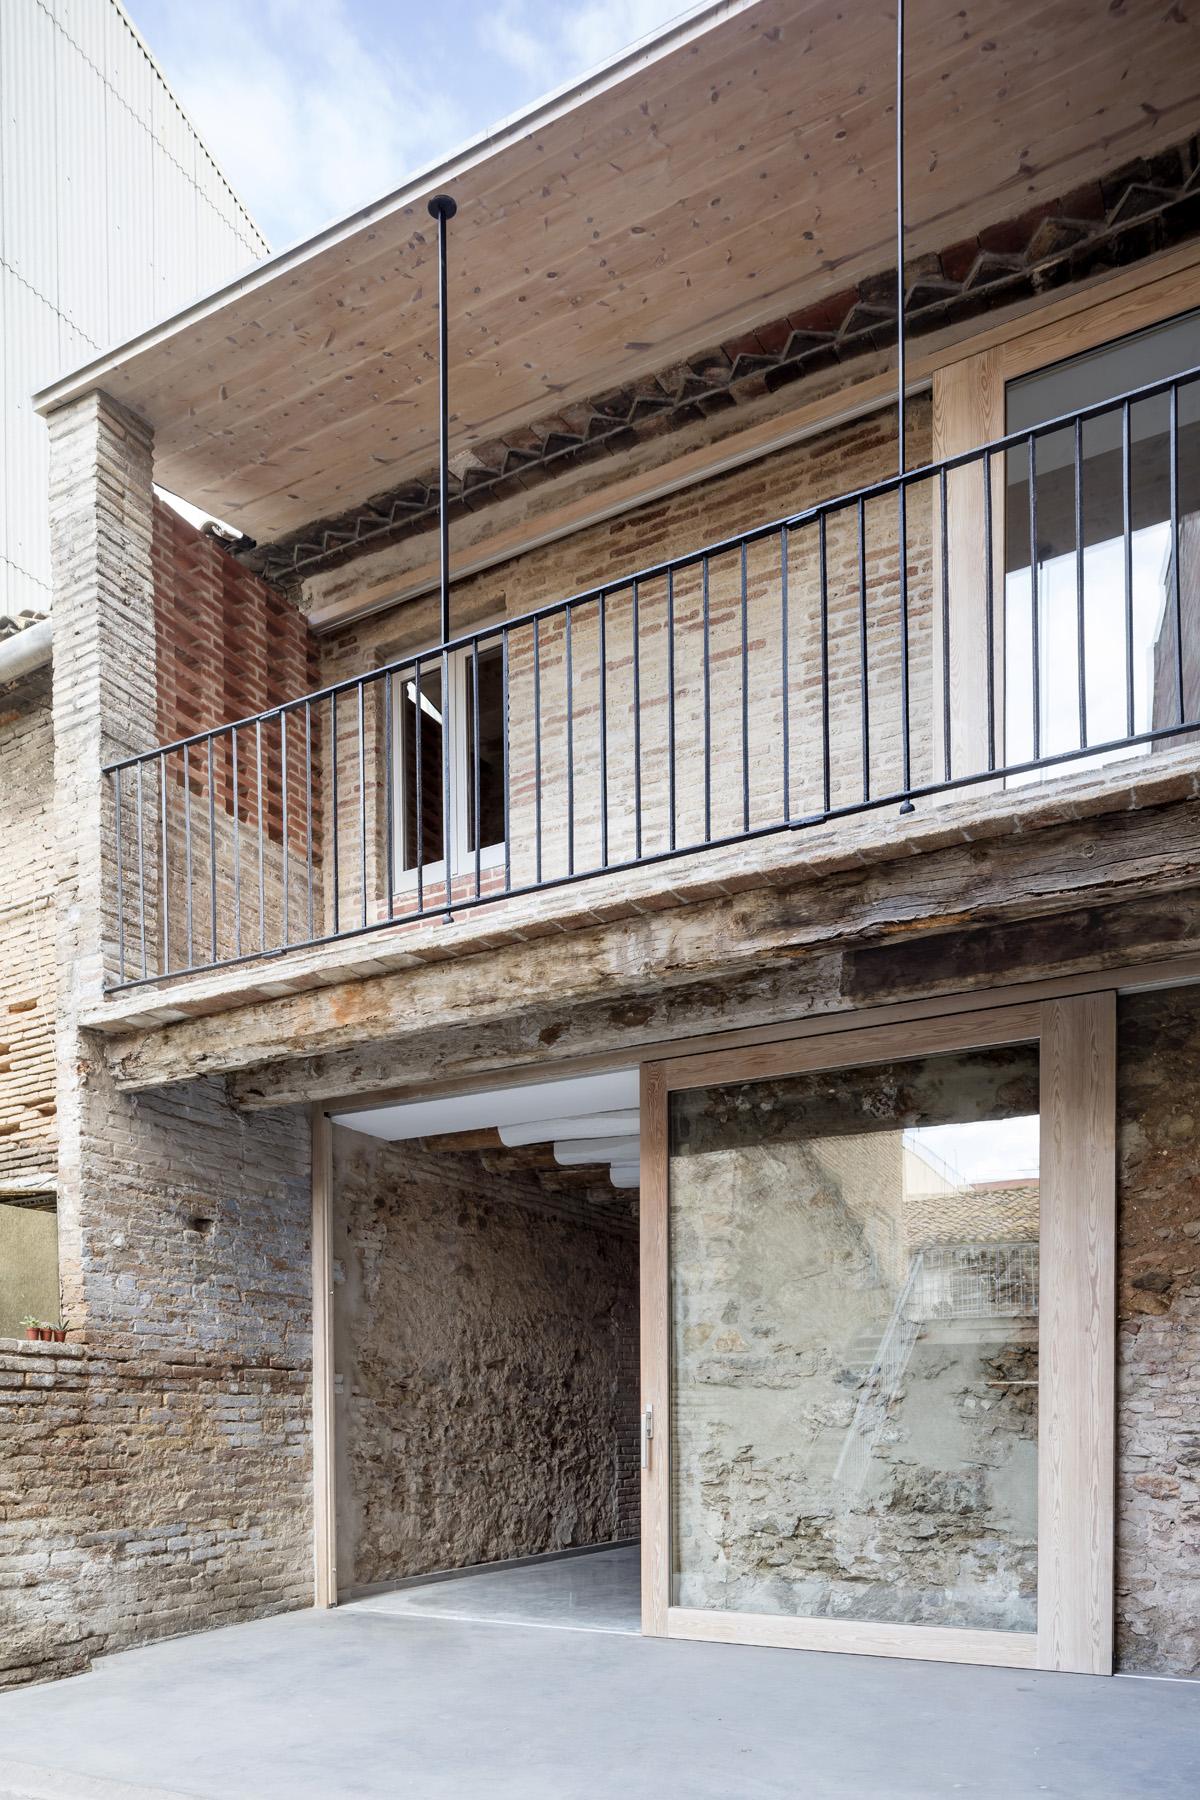 Dataae rehabilitaci n de una casa entre medianeras en sant feliu de llobregat hic arquitectura - Subvenciones rehabilitacion casas antiguas ...